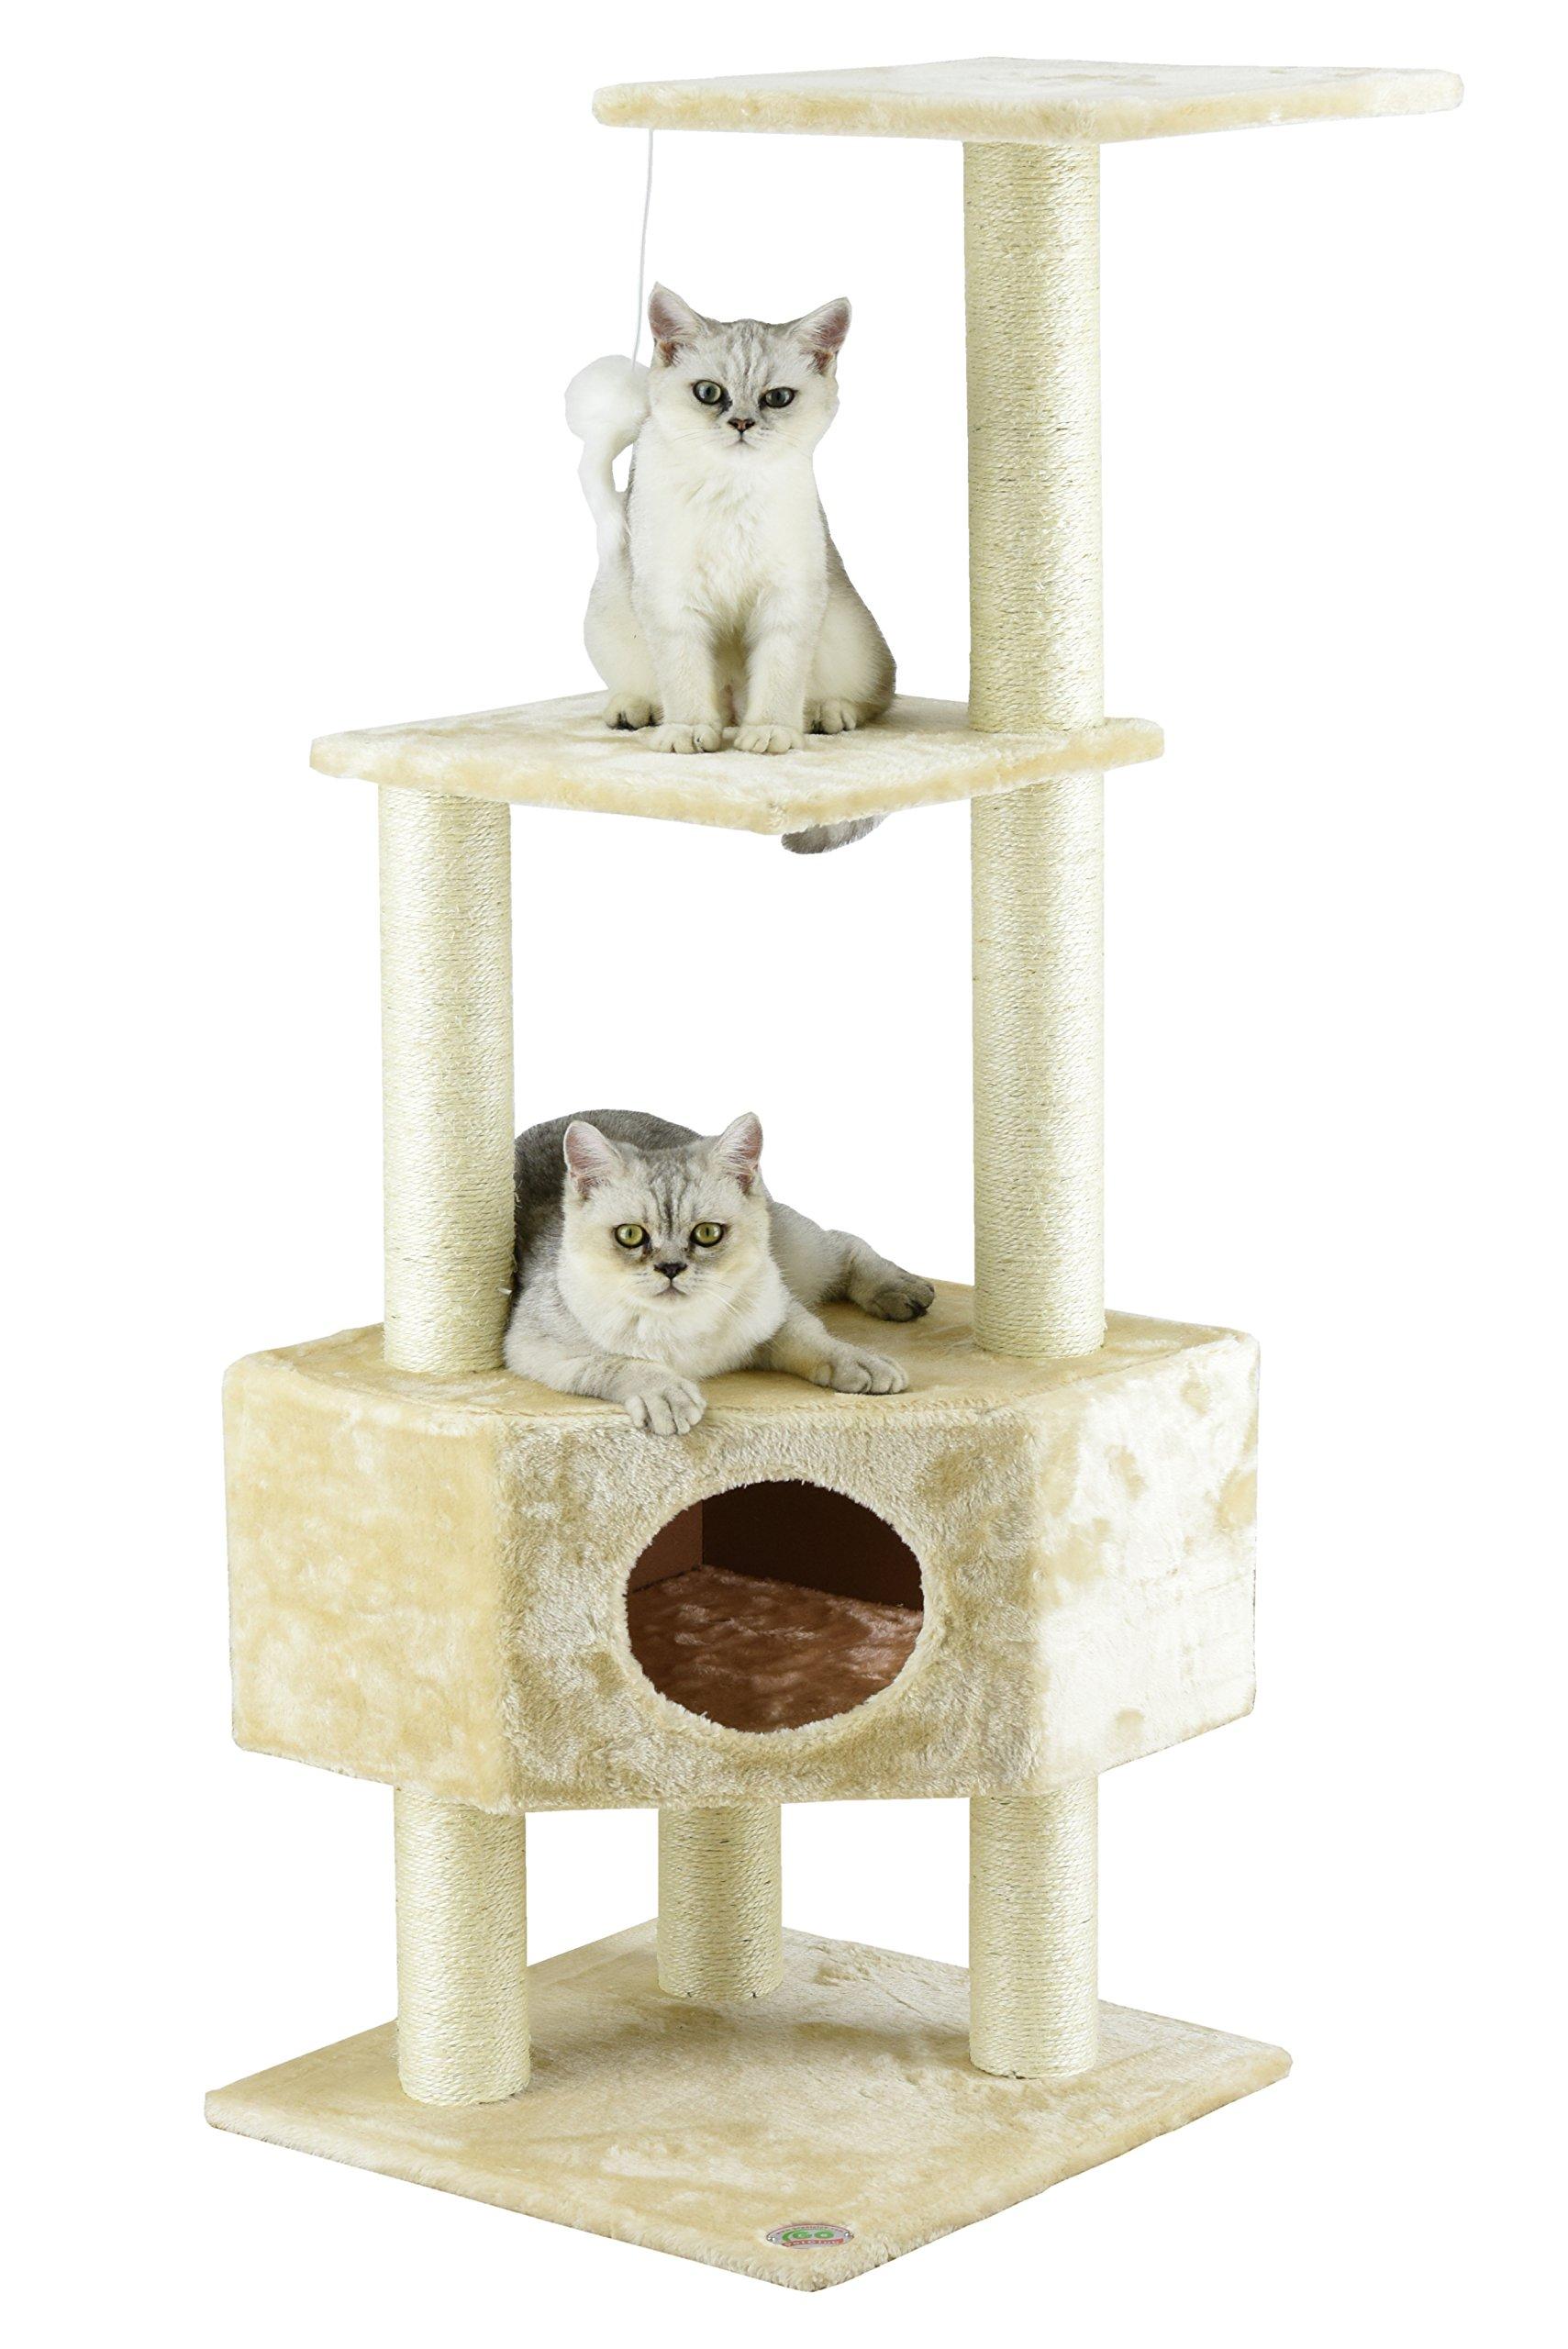 Go Pet Club Cat Tree Beige Color by Go Pet Club